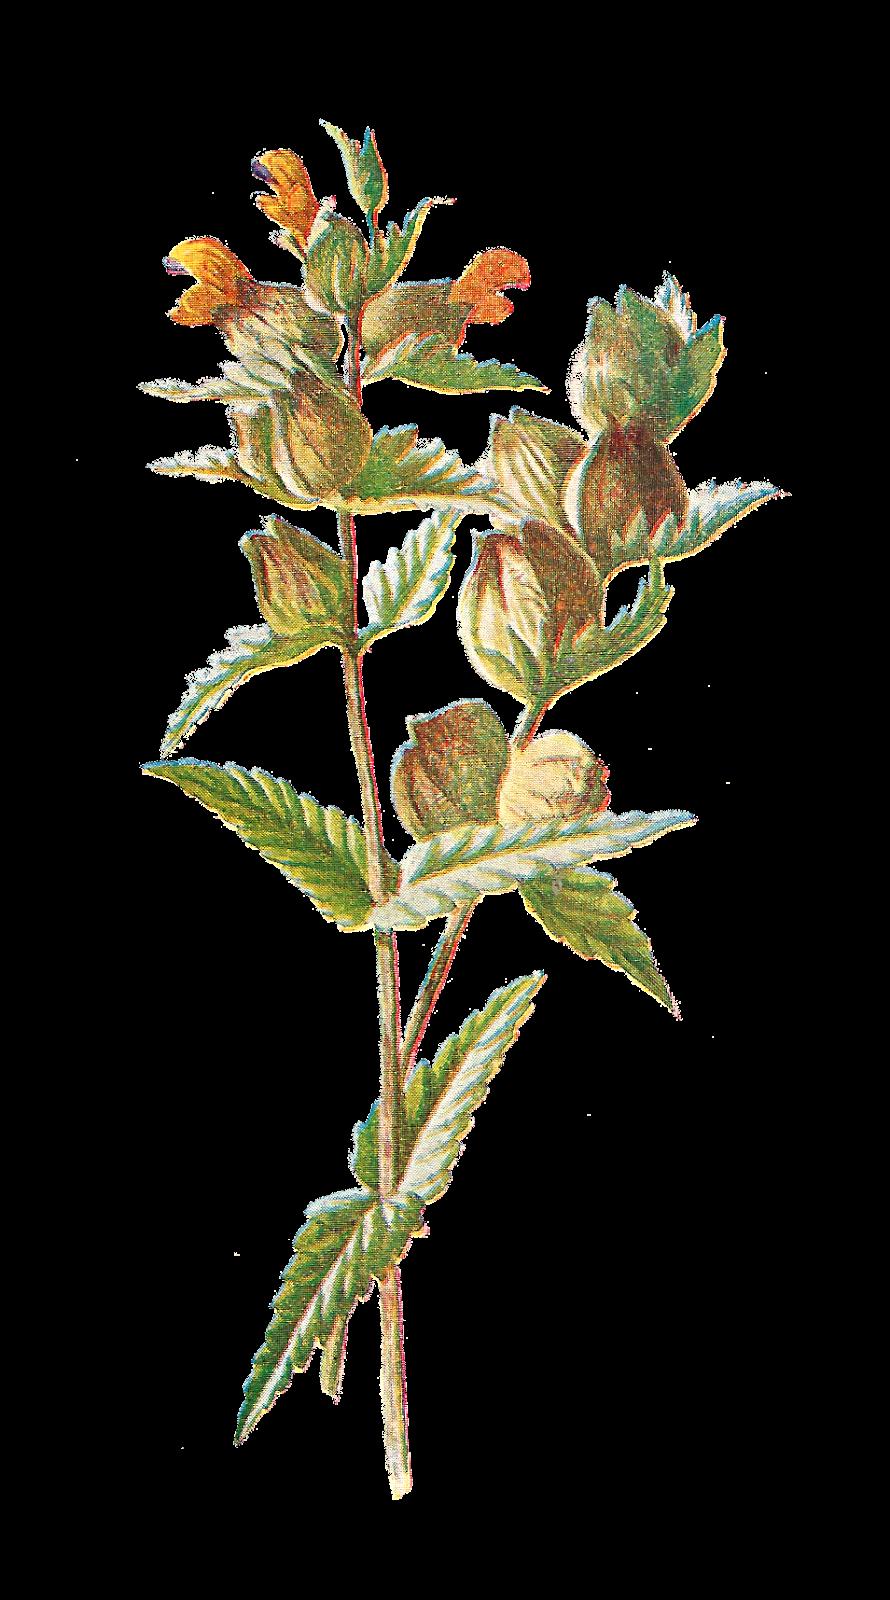 Digital flower clipart banner royalty free Antique Images: Free Digital Flower Clip Art: Wildflower Graphic o ... banner royalty free